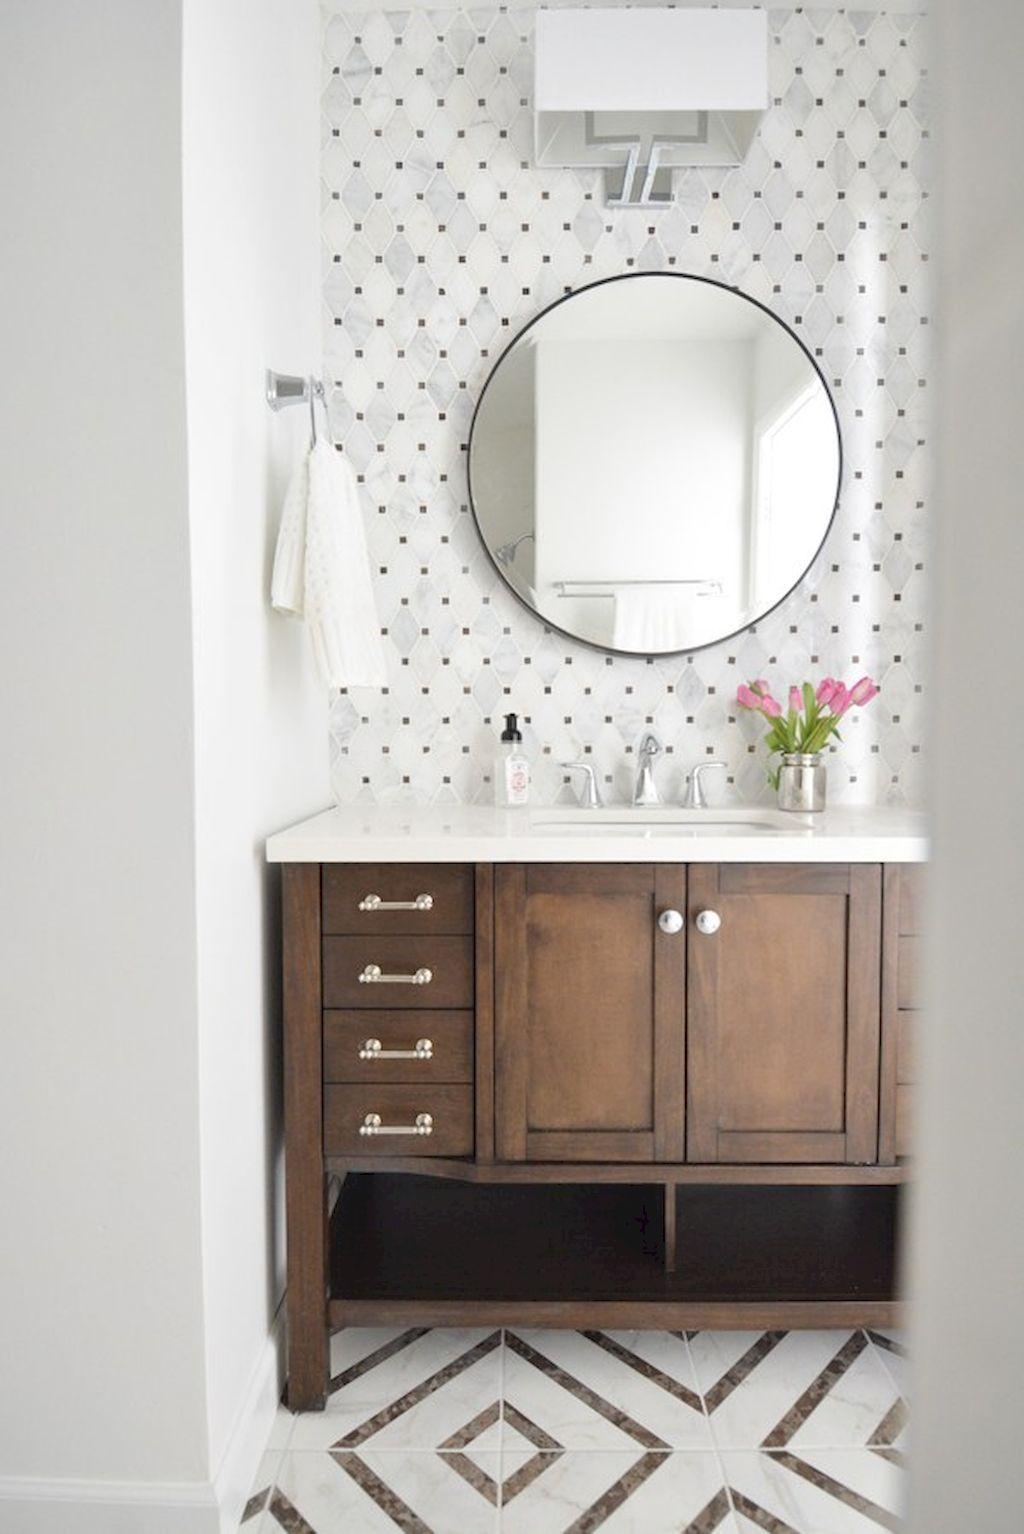 Cool small master bathroom remodel ideas (16) | bathroom | Pinterest ...